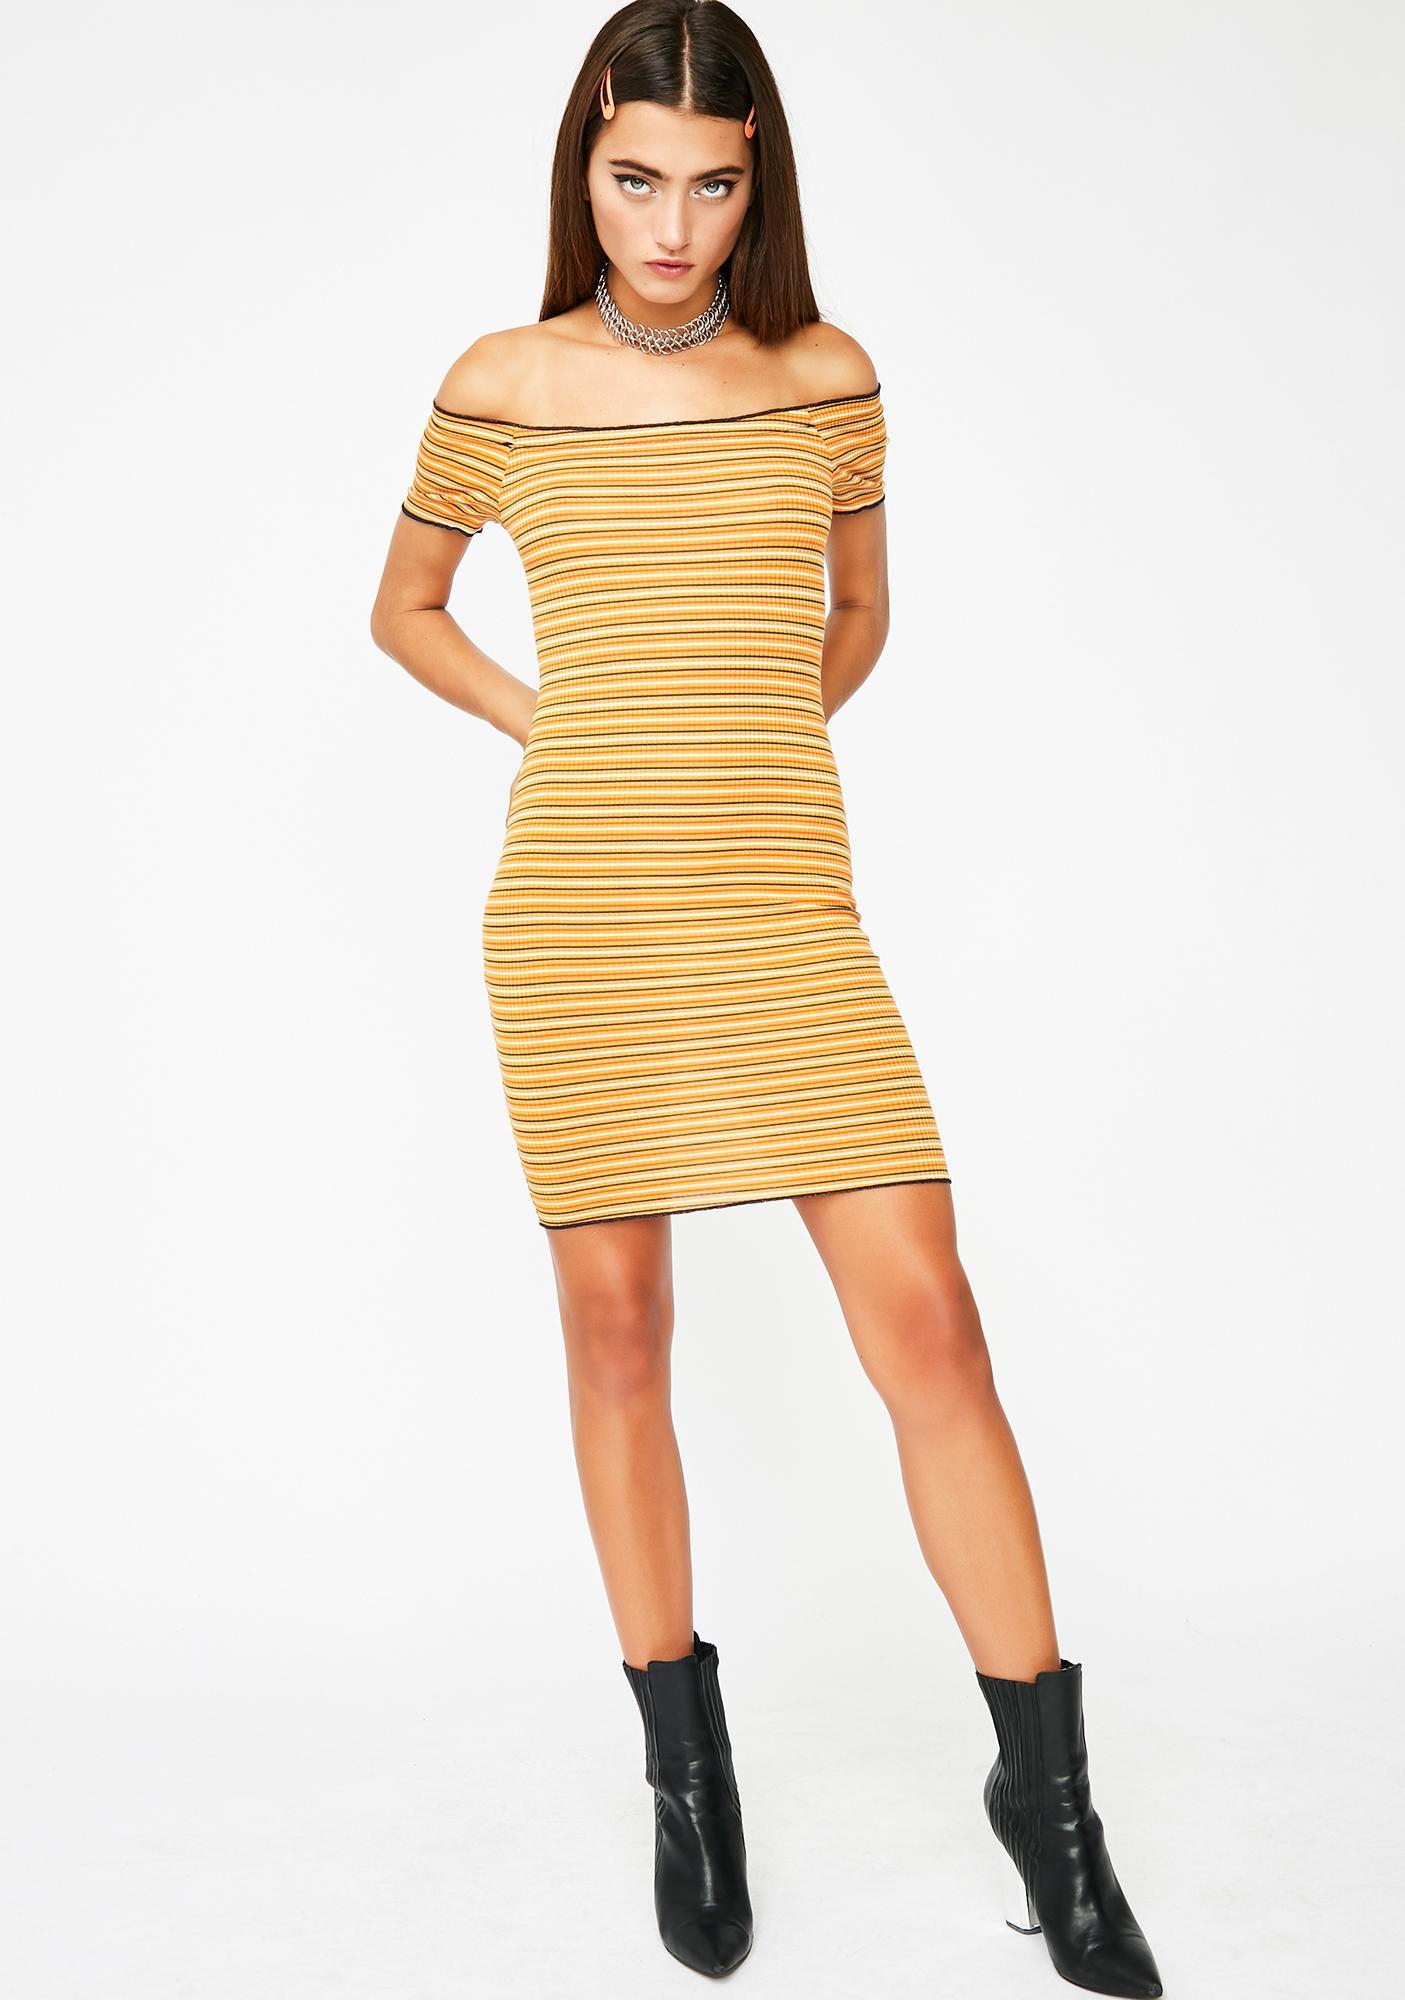 Too Flashy Striped Dress